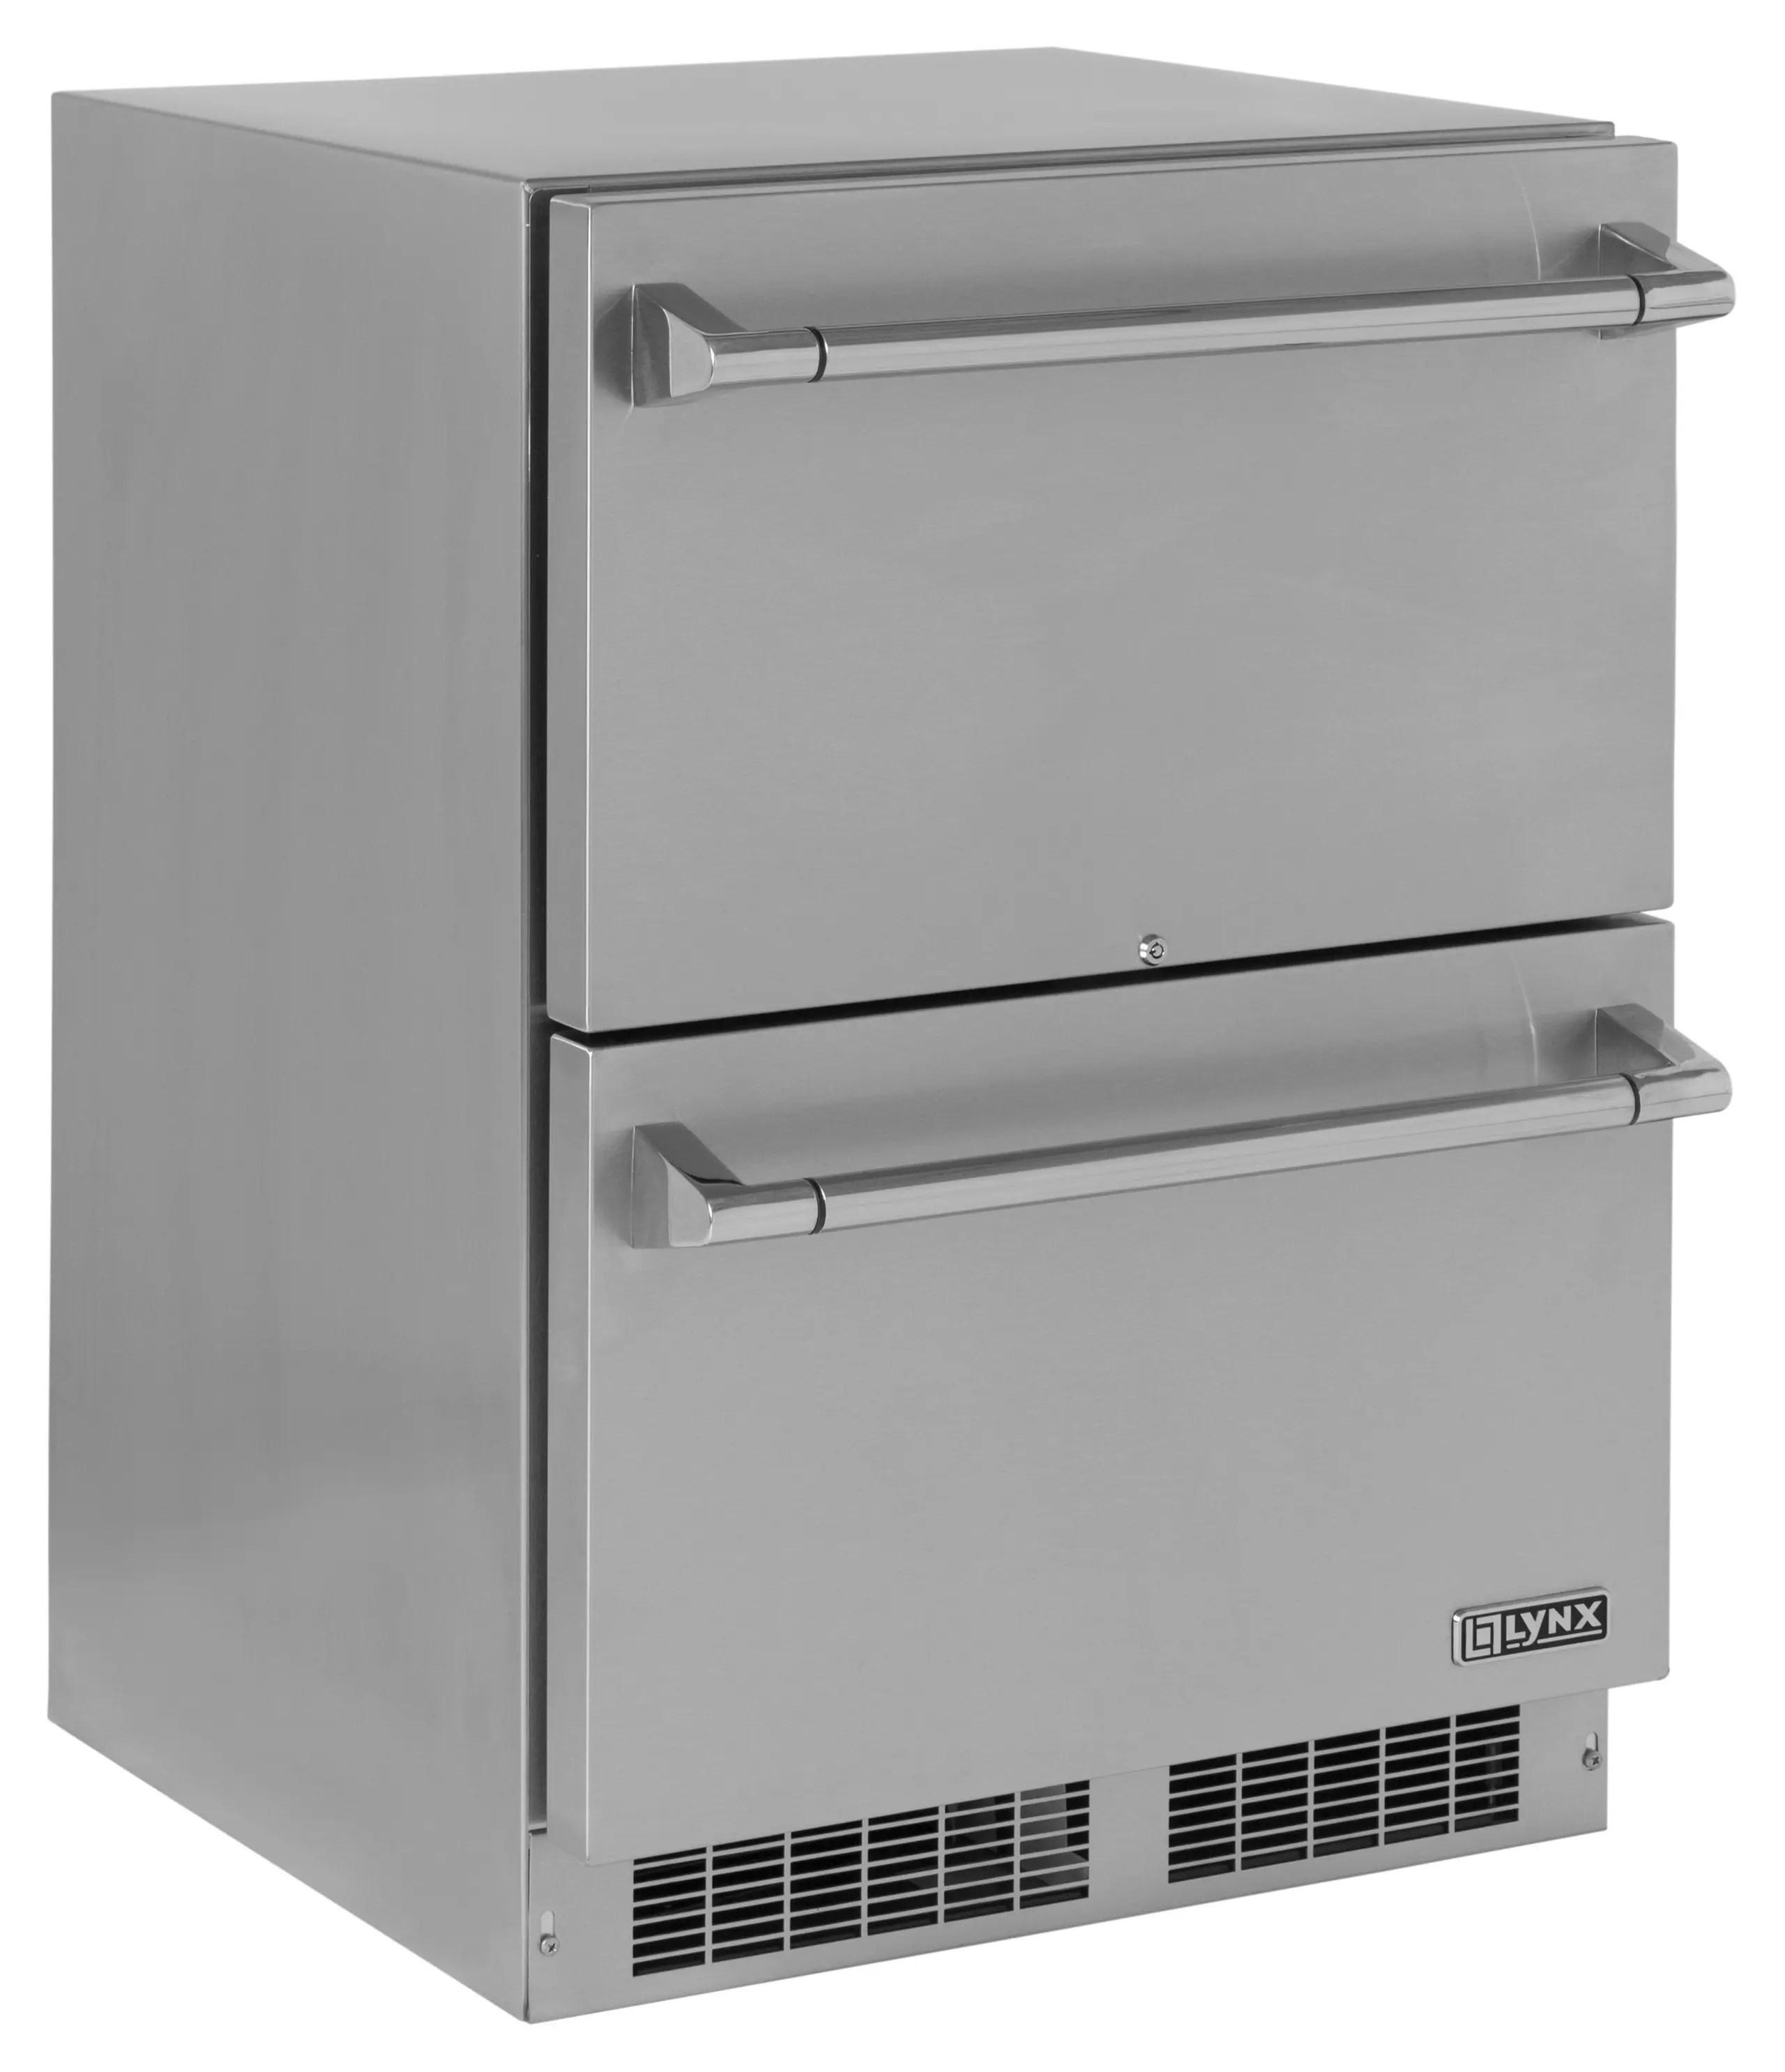 "24"" Two Drawer Refrigerator"